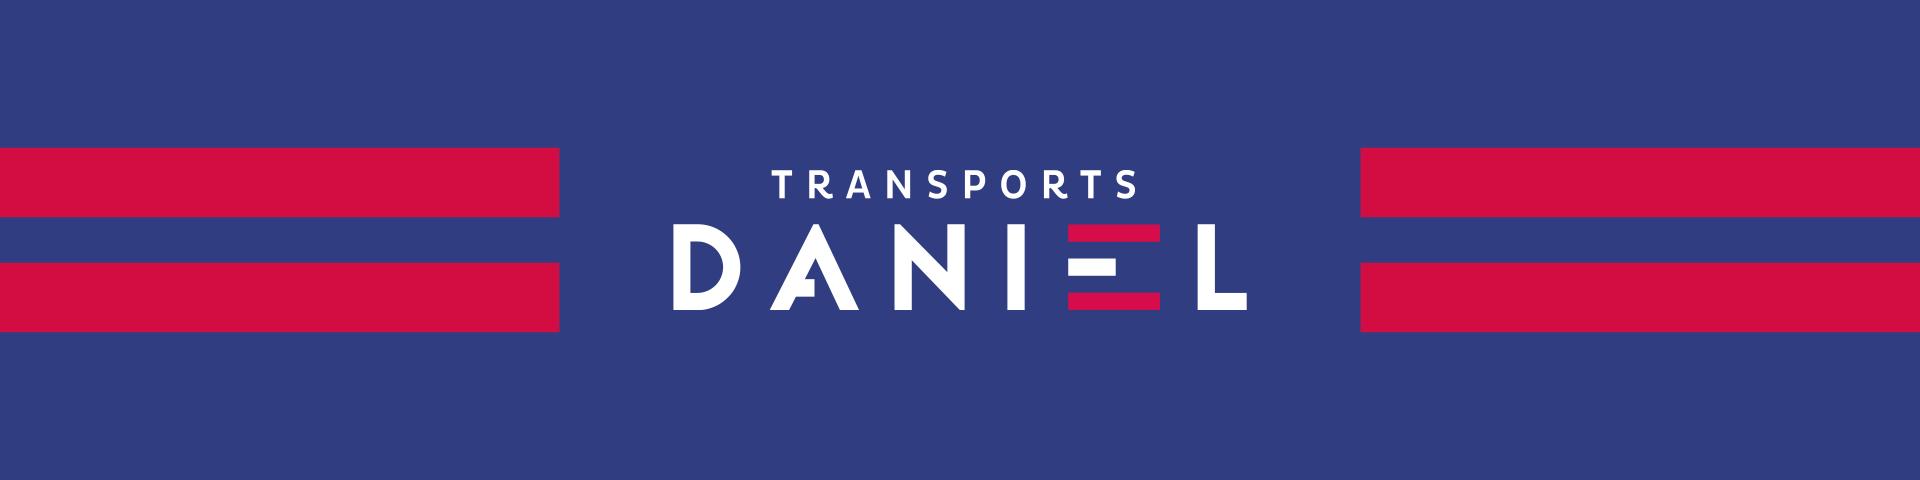 Transports Daniel Slide1